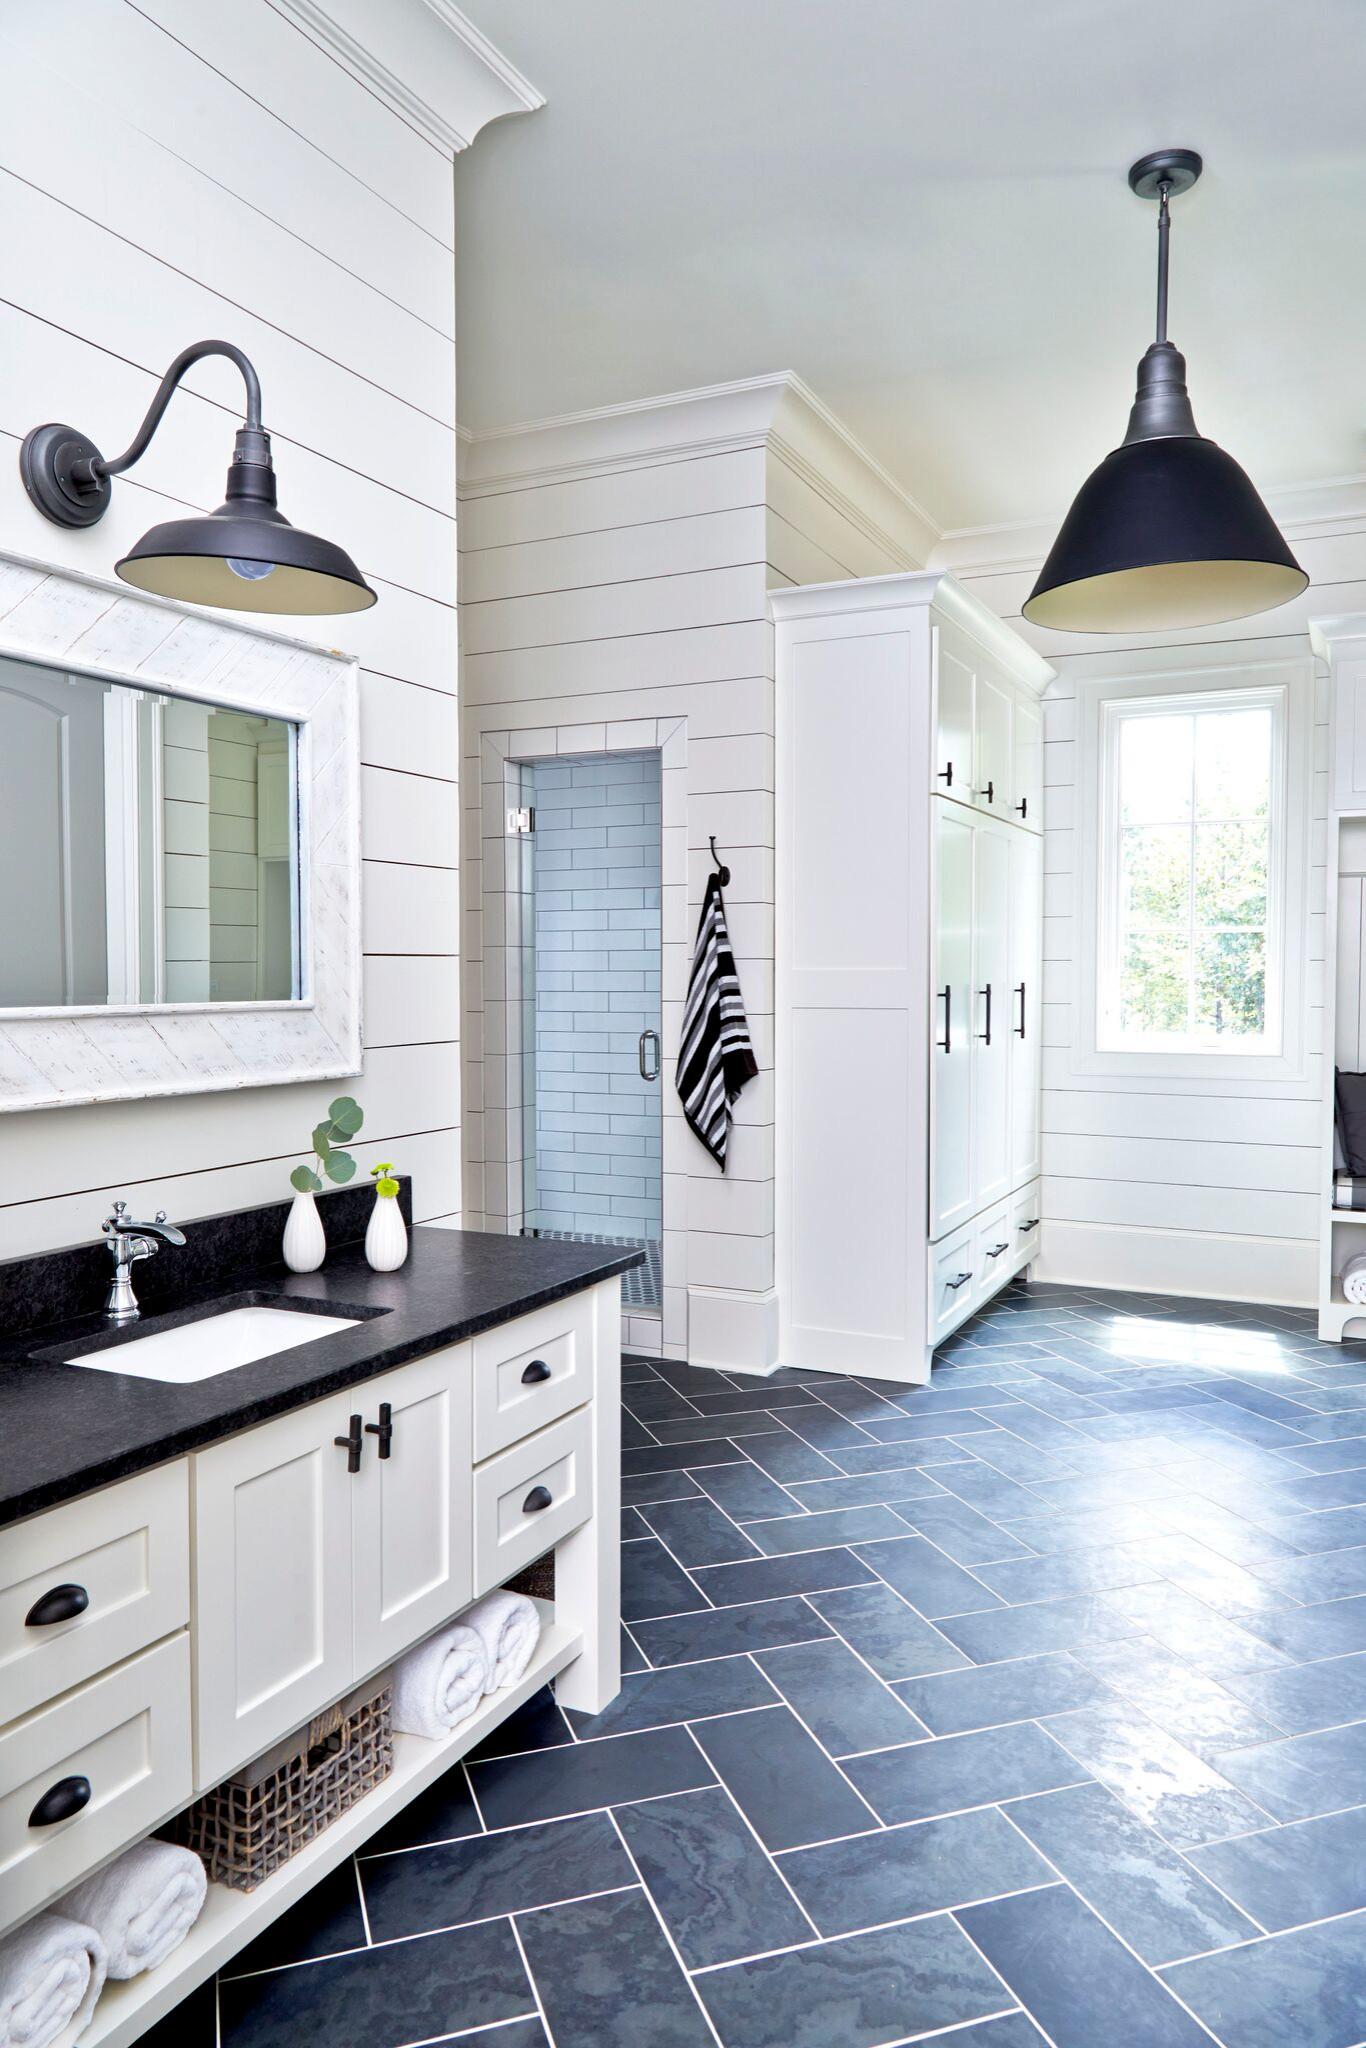 75 Beautiful Farmhouse Slate Floor Bathroom Pictures Ideas April 2021 Houzz